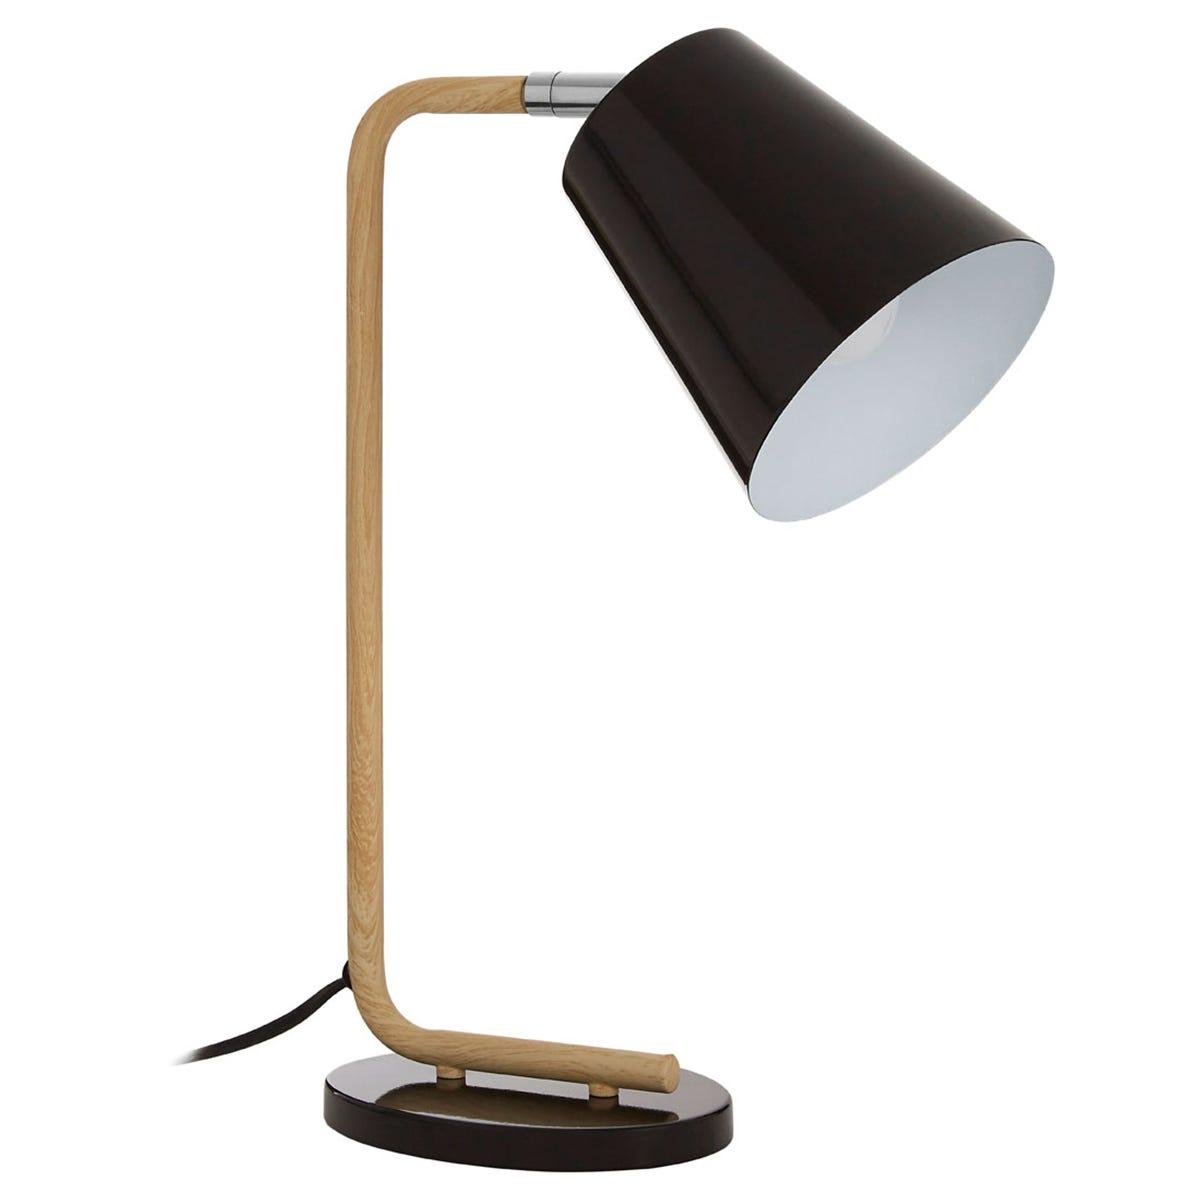 Premier Housewares Bruin Table Lamp in Wood/Metal - Black